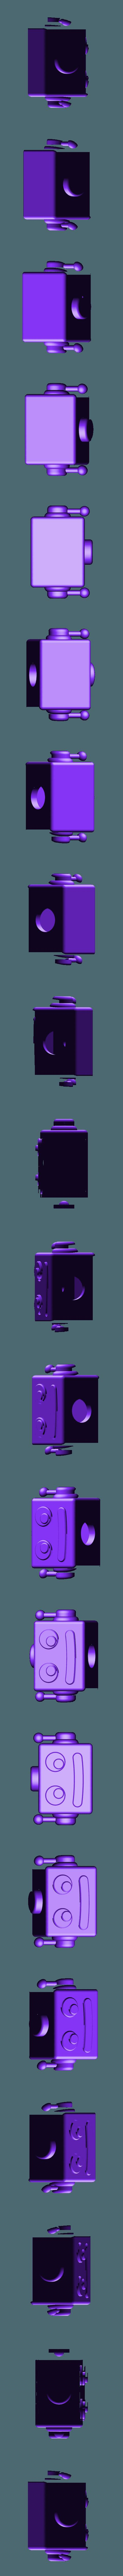 ada-head.stl Download free STL file Webcam Cover-Up Lego brick with Adabot Mini Fig • 3D printable design, Adafruit